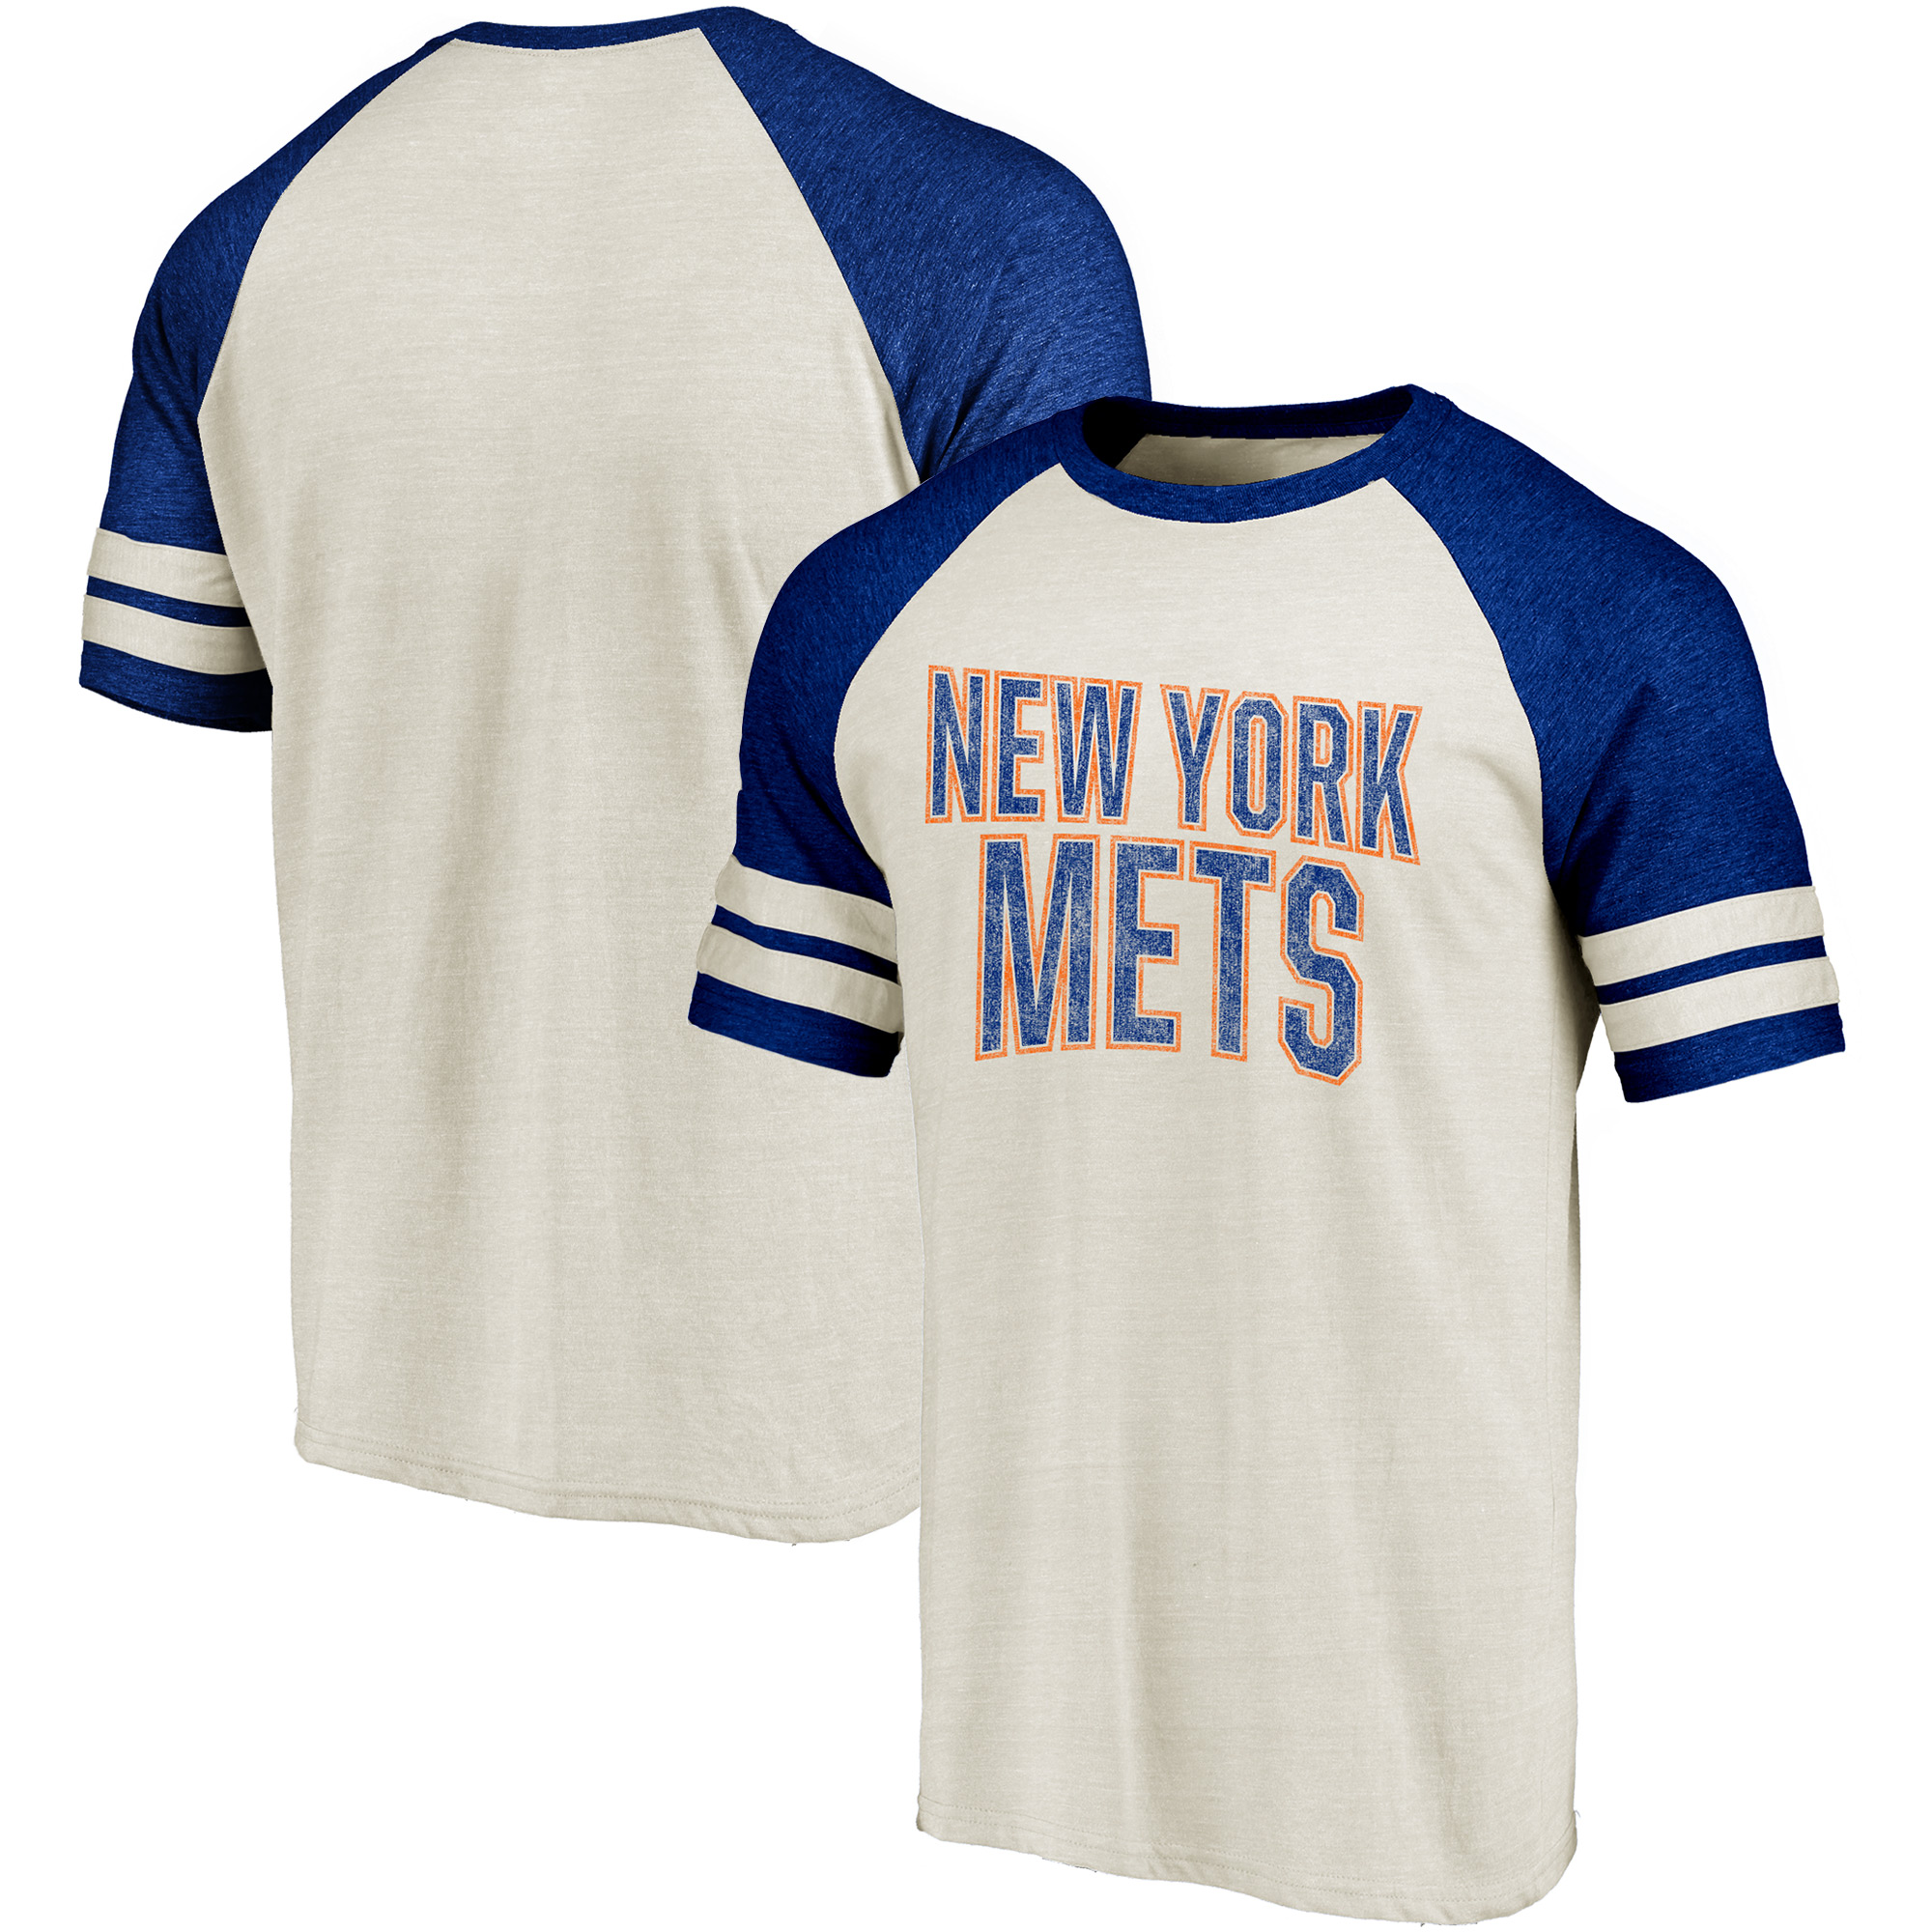 New York Mets Fanatics Branded True Classics Colorblock Raglan T-Shirt - Cream/Royal